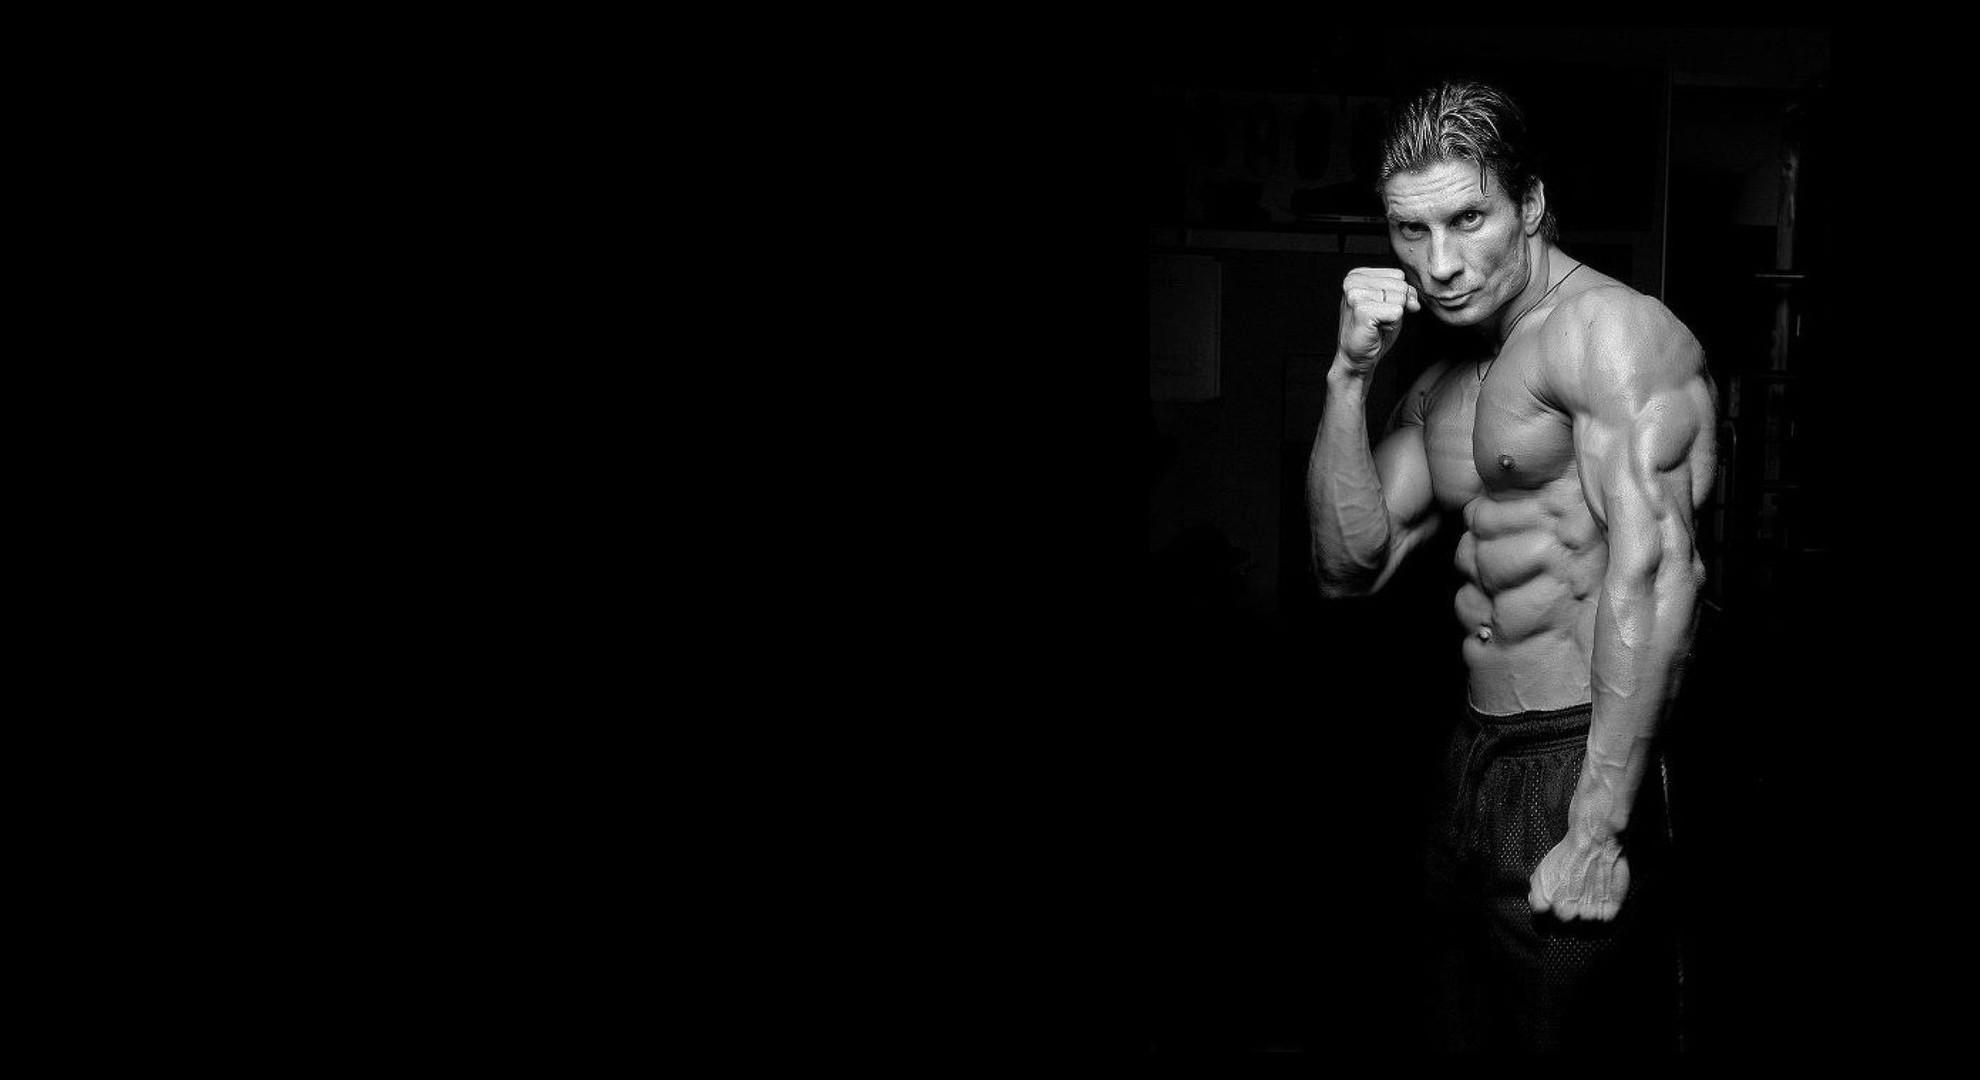 John Cena Full Hd Wallpaper | HD Wallpapers | Pinterest | John cena and  Wallpaper